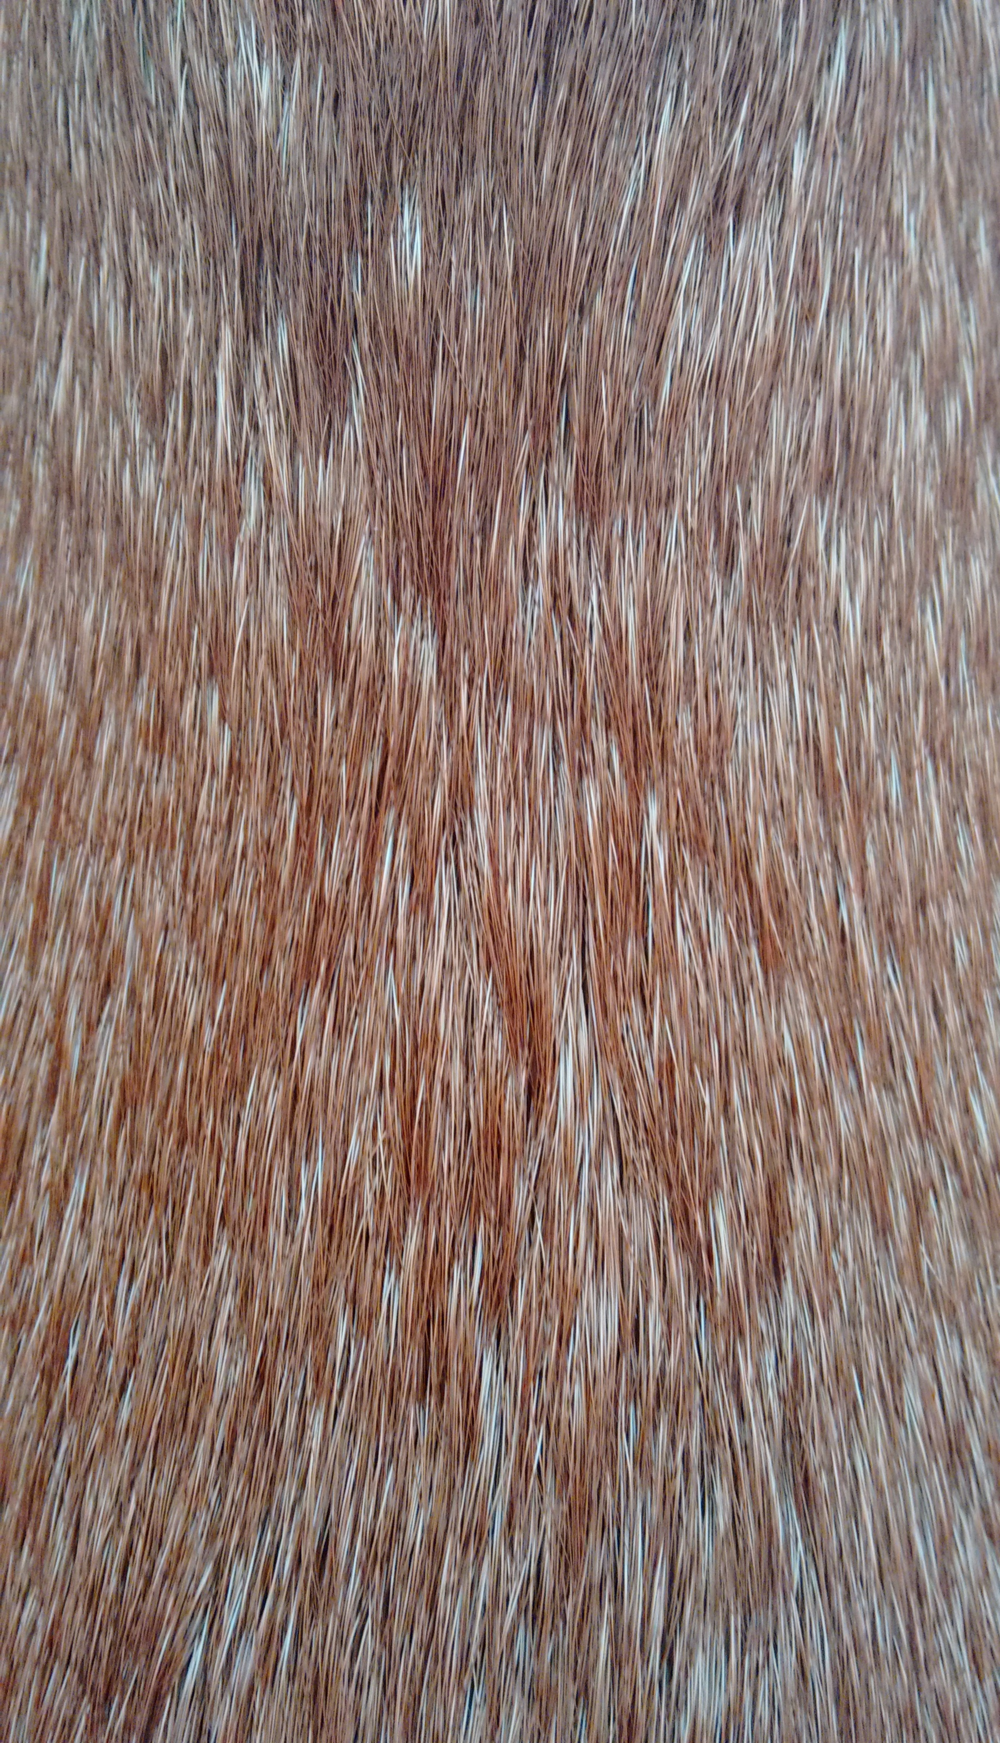 Haya's fur